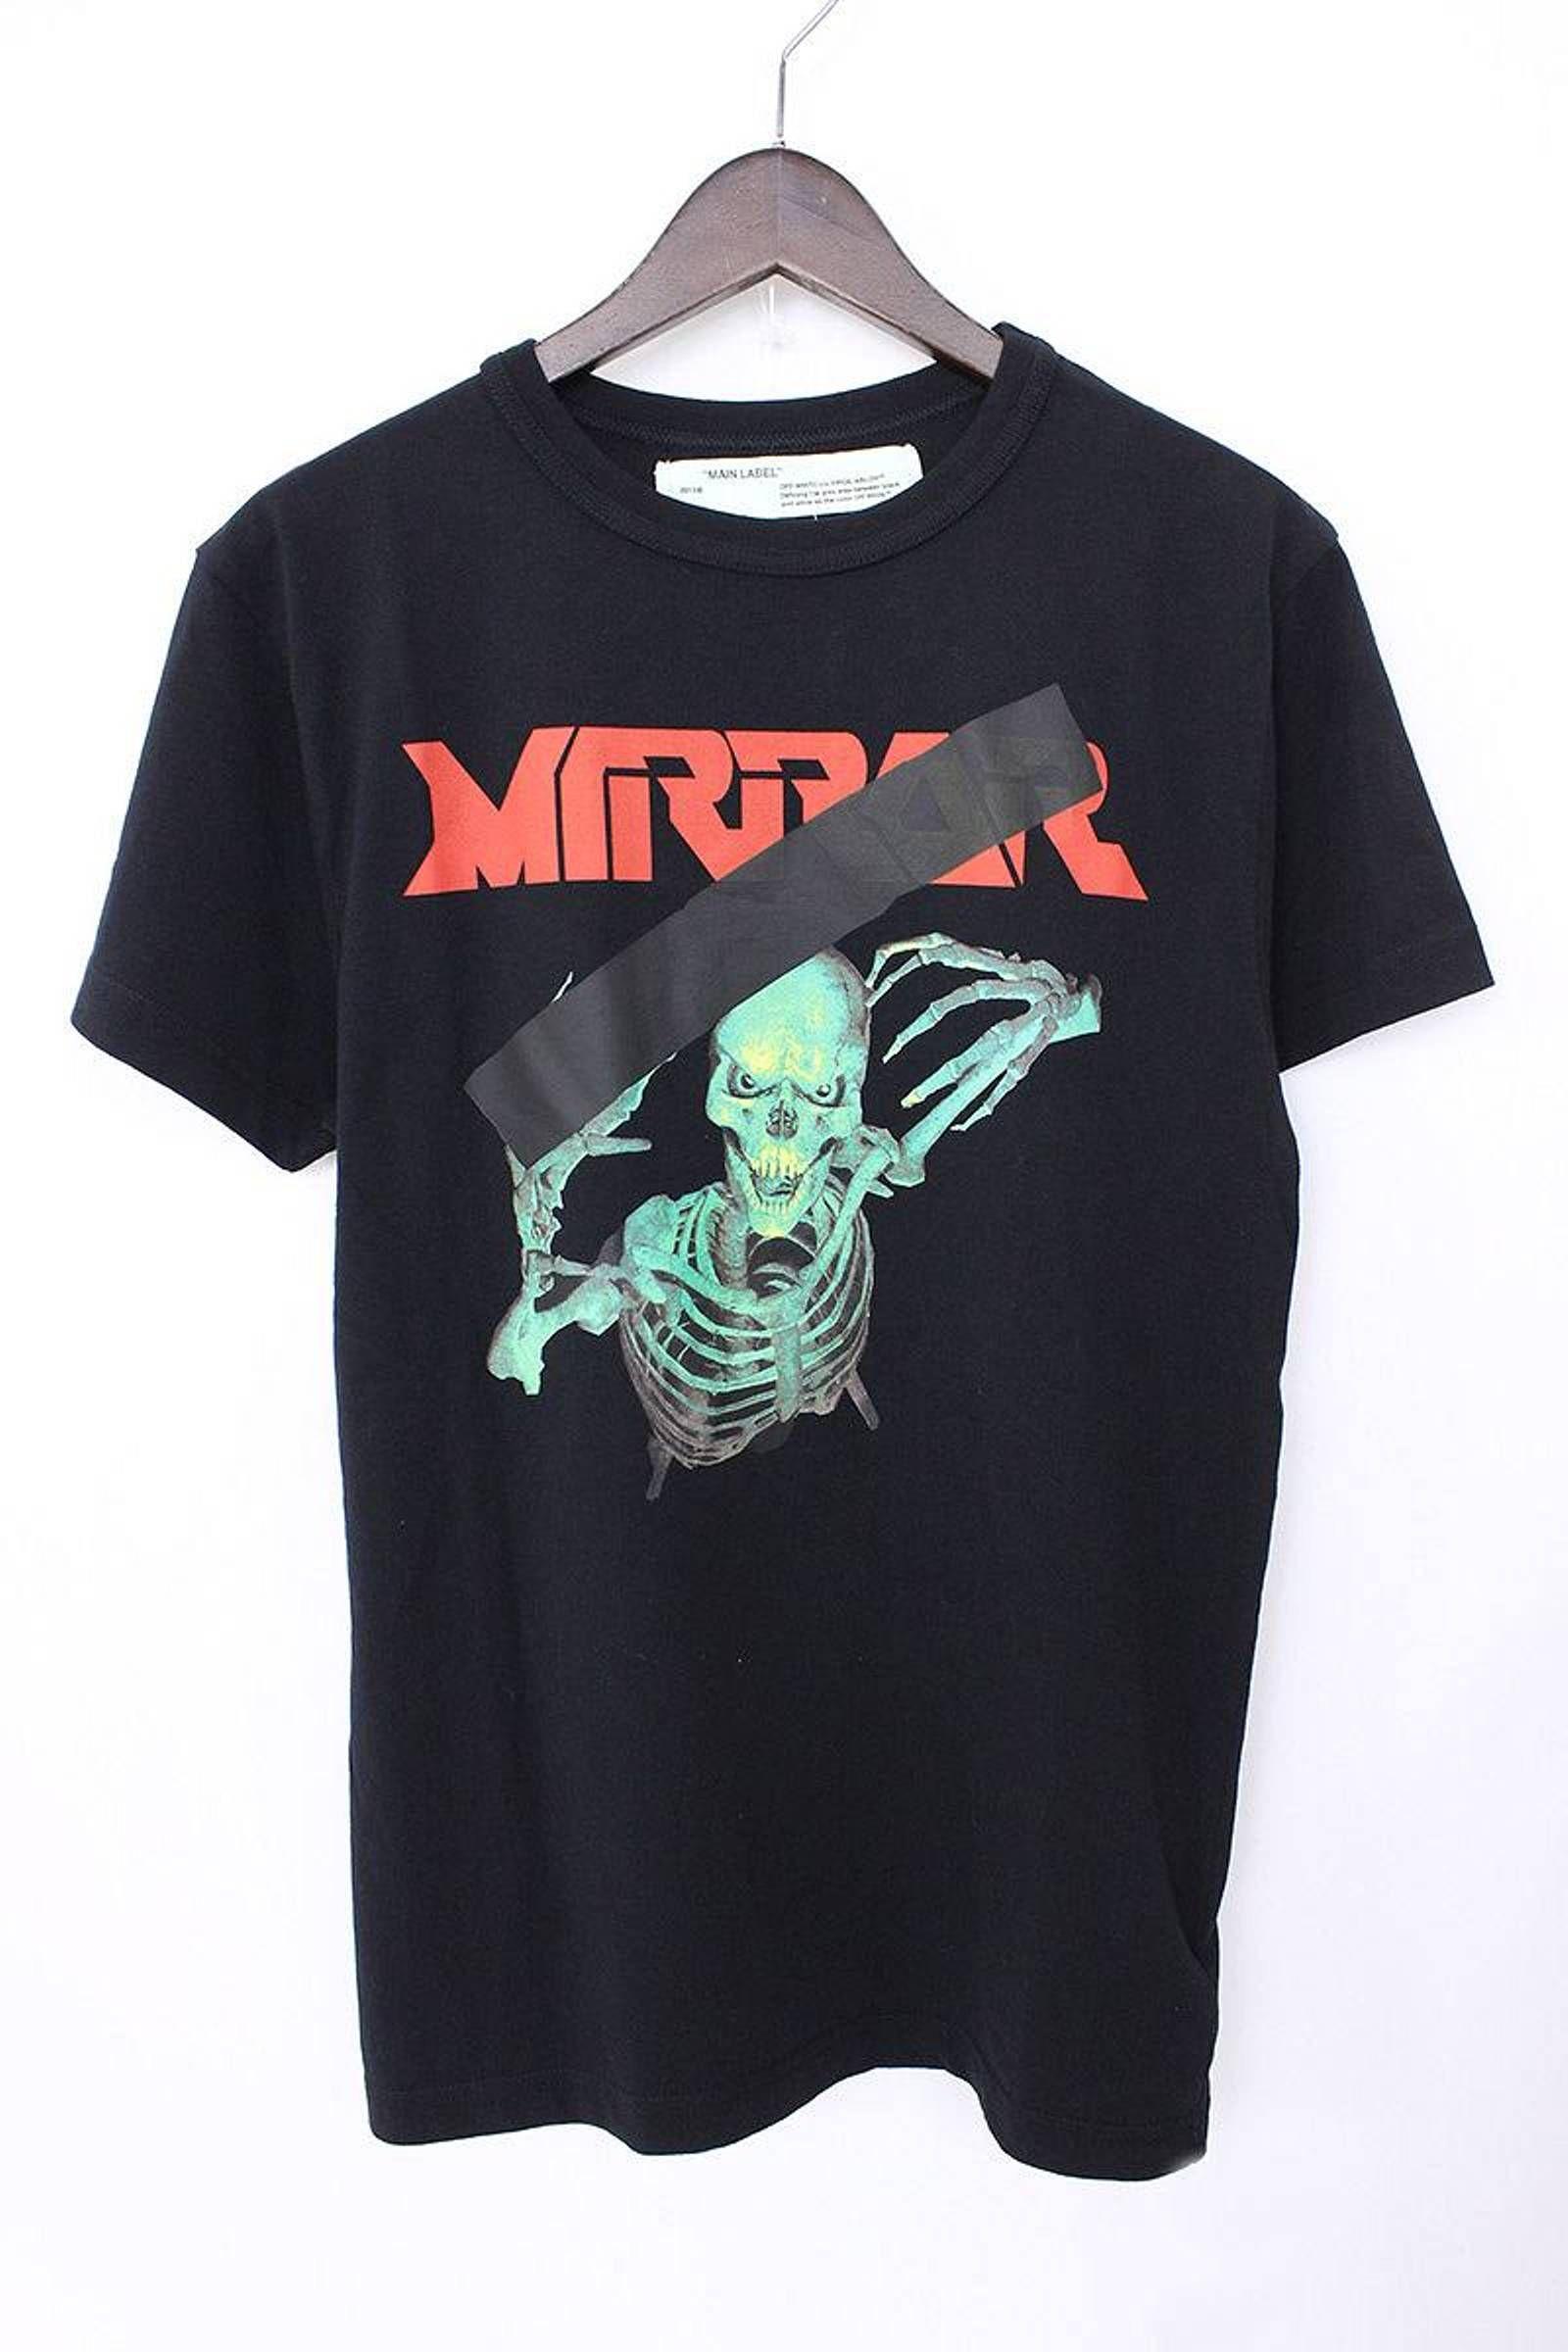 7b742134 Off-White T-Shirt Black Mirror Skull Print Tee Size US S / EU 44-46 / 1